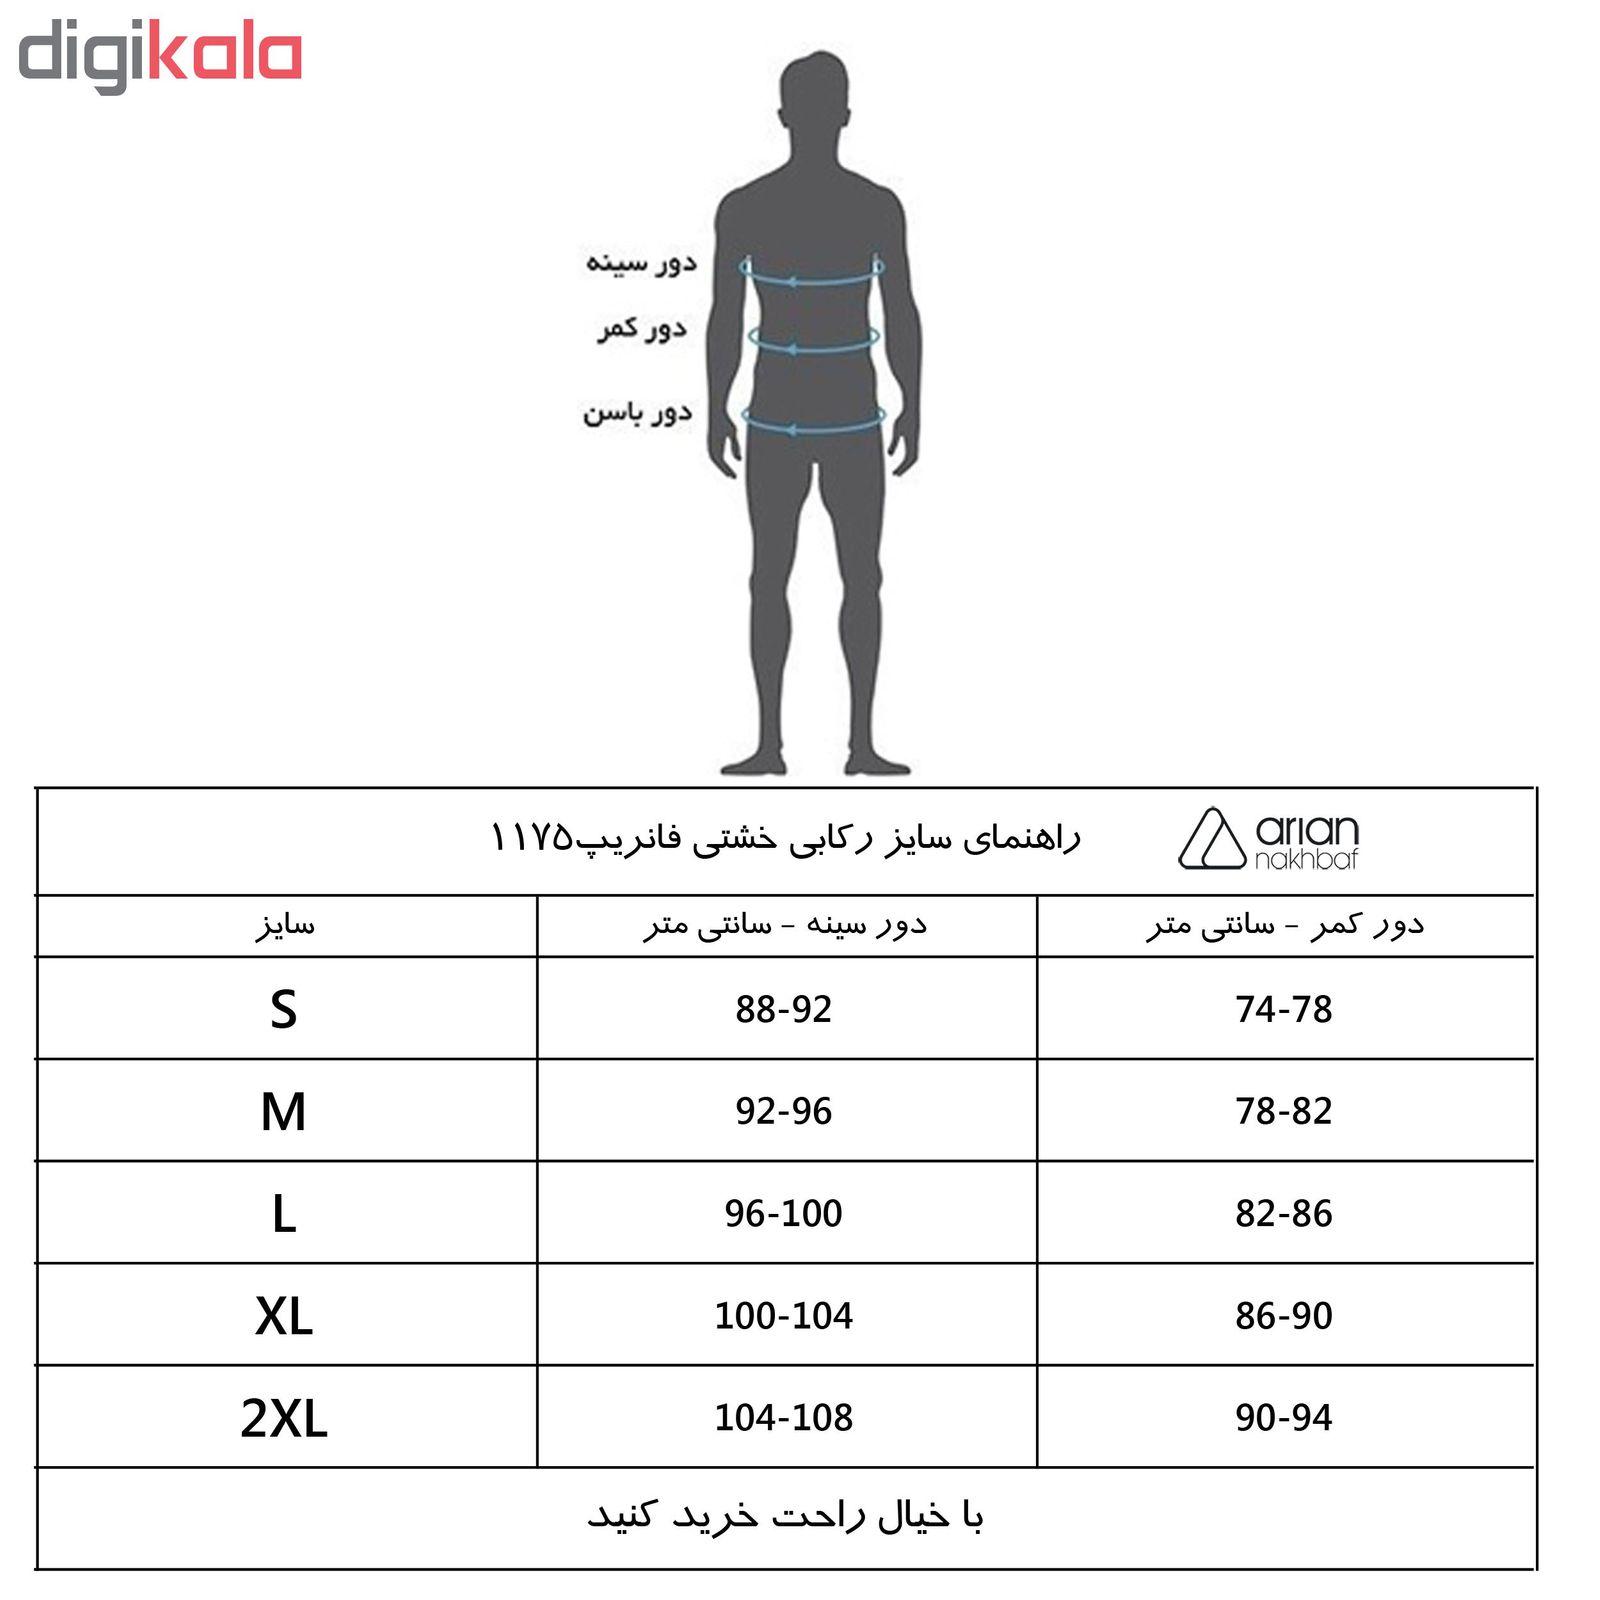 زیرپوش مردانه آریان نخ باف کد 1175 main 1 2